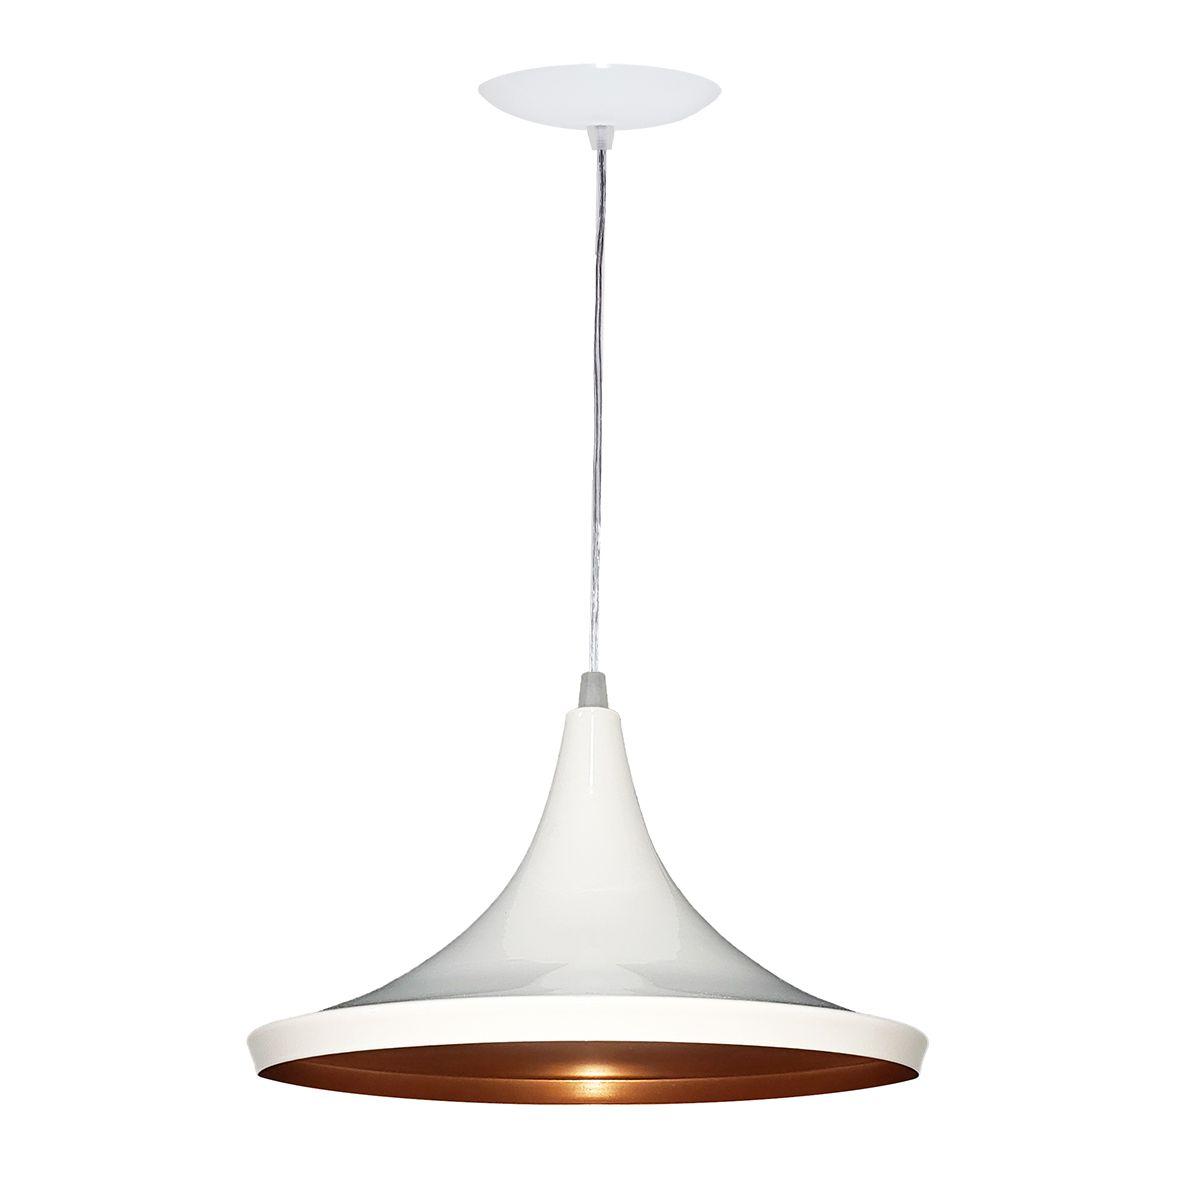 Luminária Decorativa Prato Chinês 27 Branco/Cobre Pendente